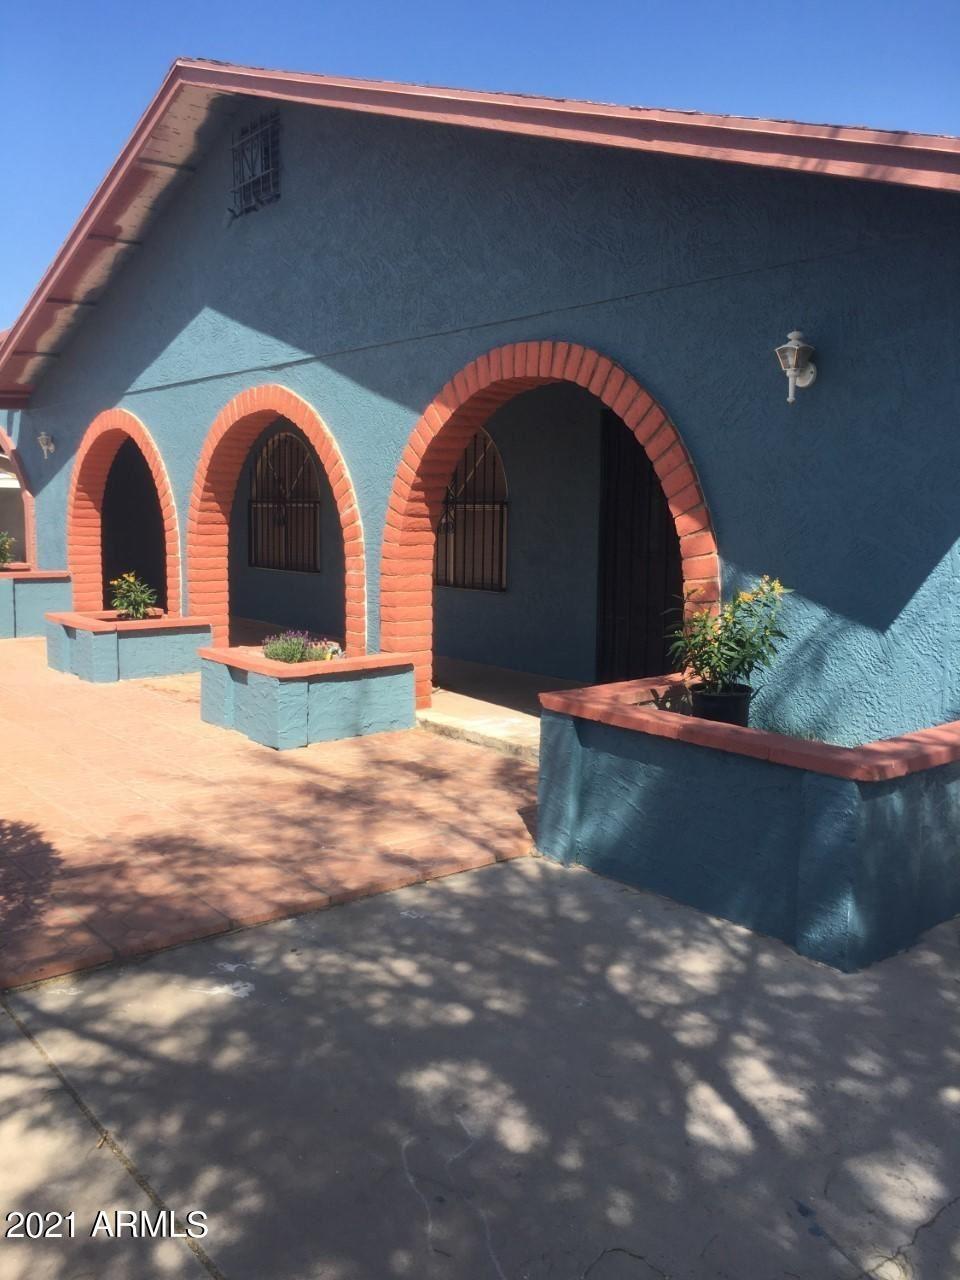 Photo of 11218 W YUMA Street, Avondale, AZ 85323 (MLS # 6219983)